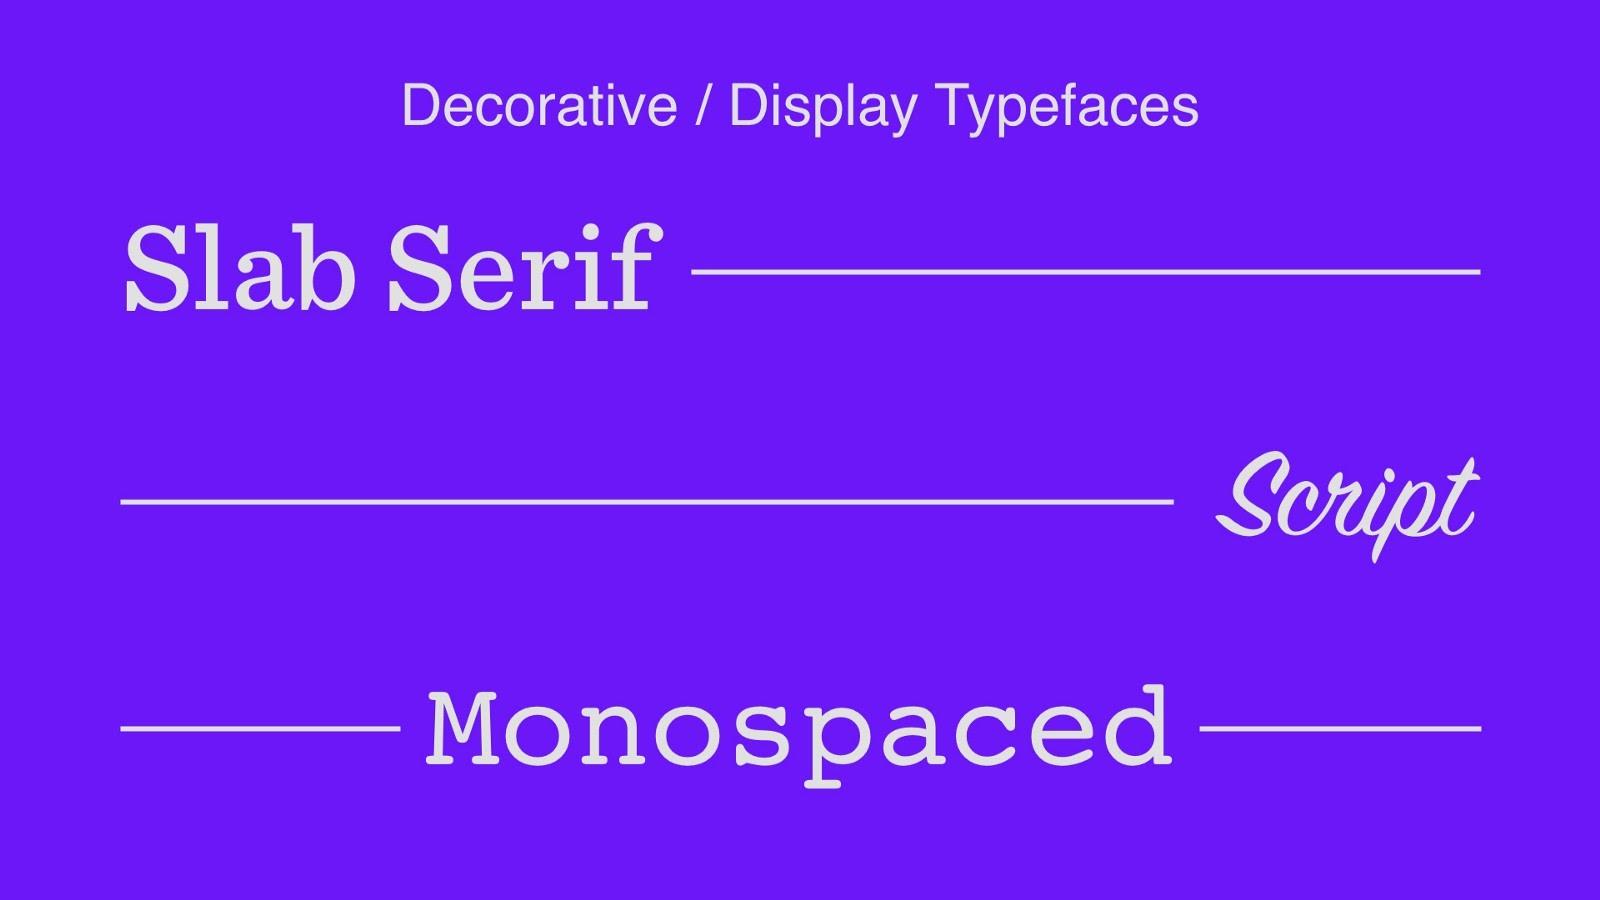 Decorative / display typefaces